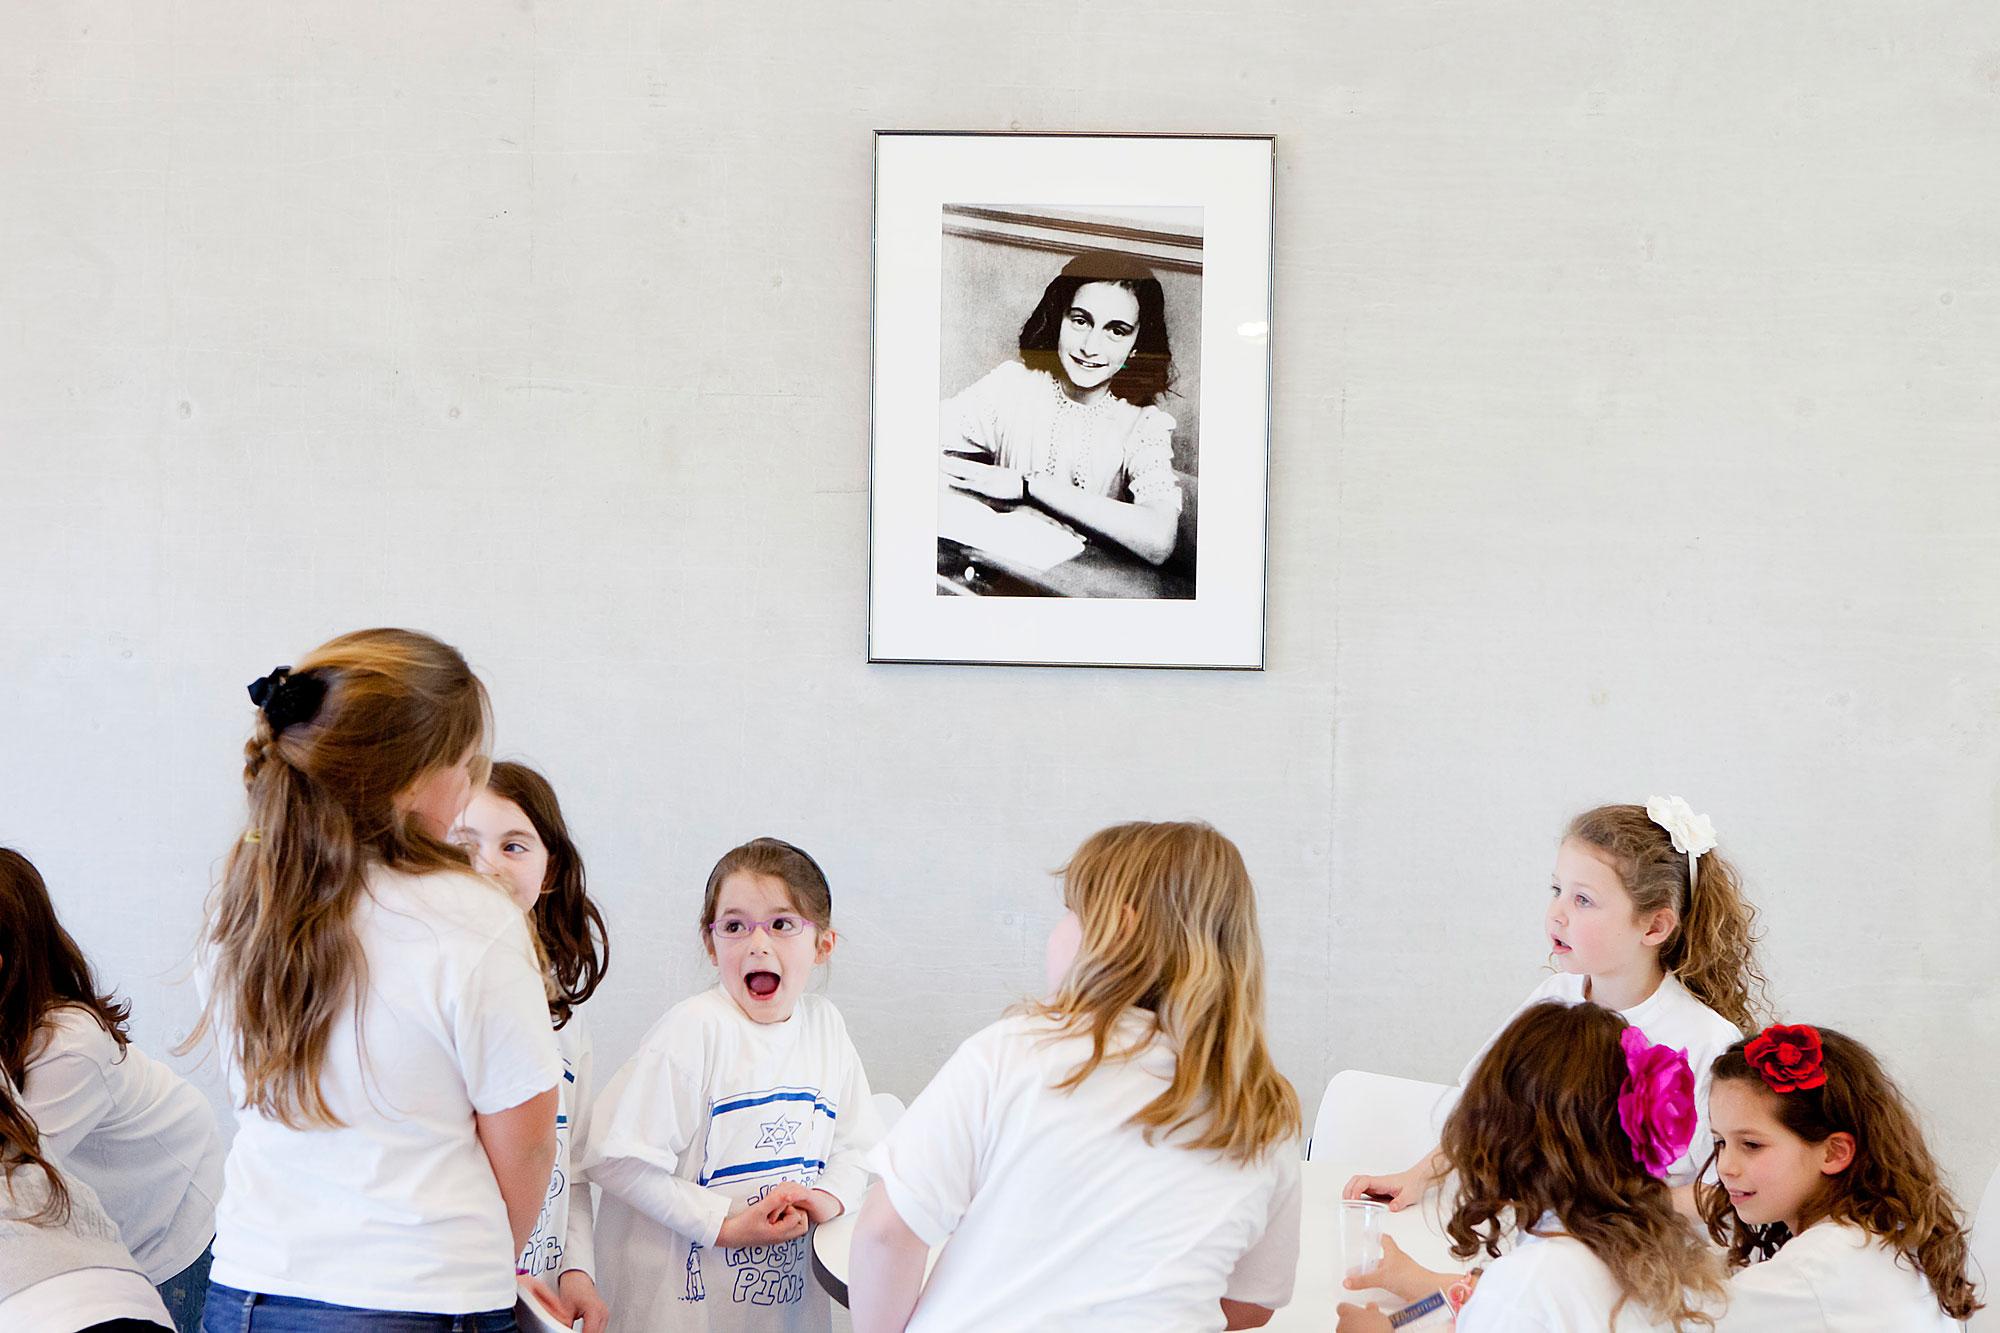 Foto van Amsterdammers en hun geloof, joodse kinderen.